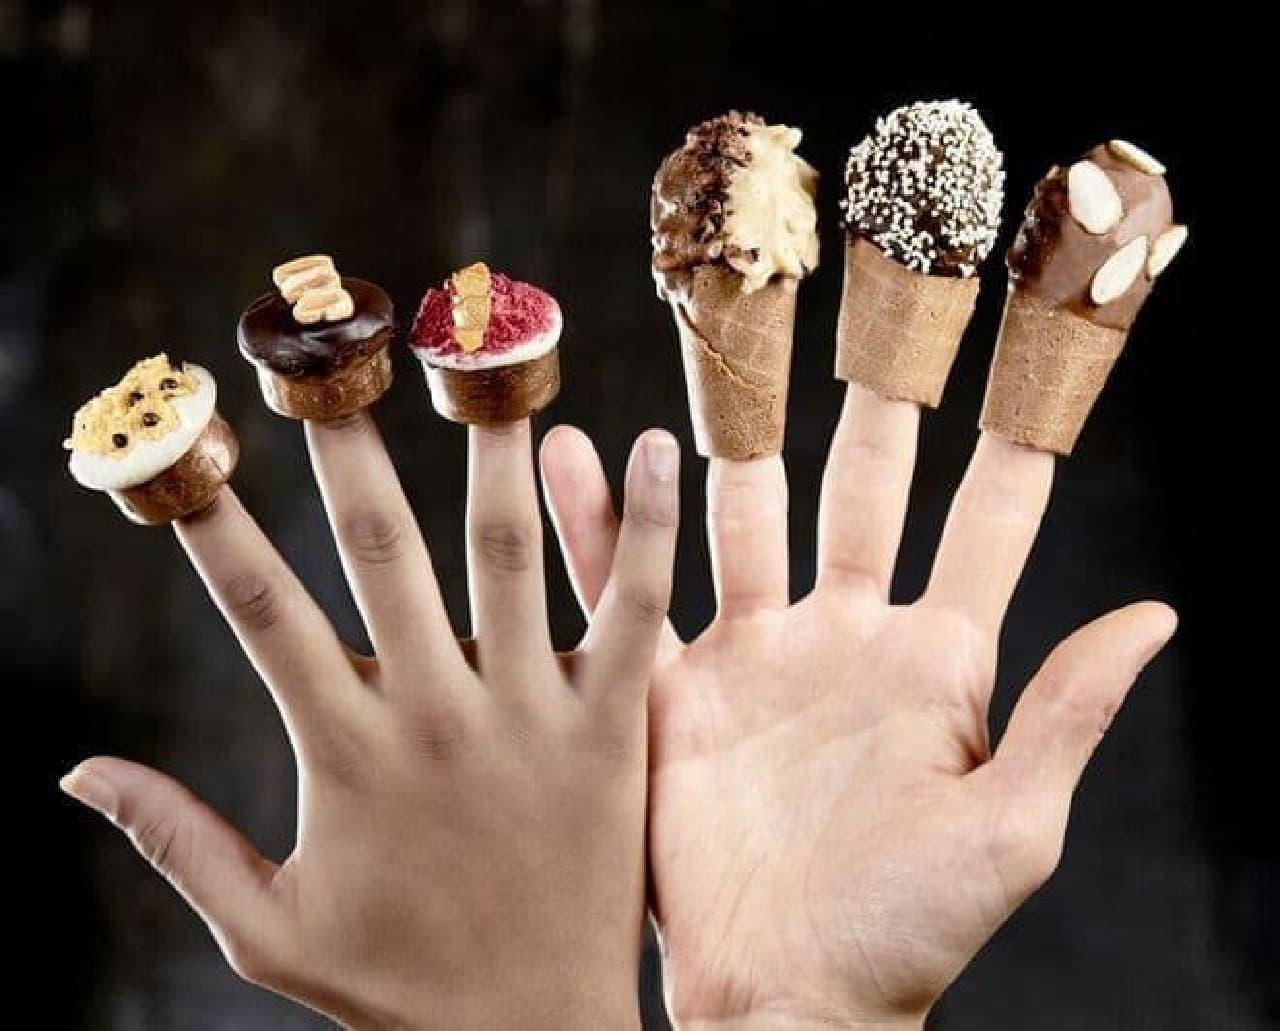 Giapoの新作「指にはめるアイスクリーム」